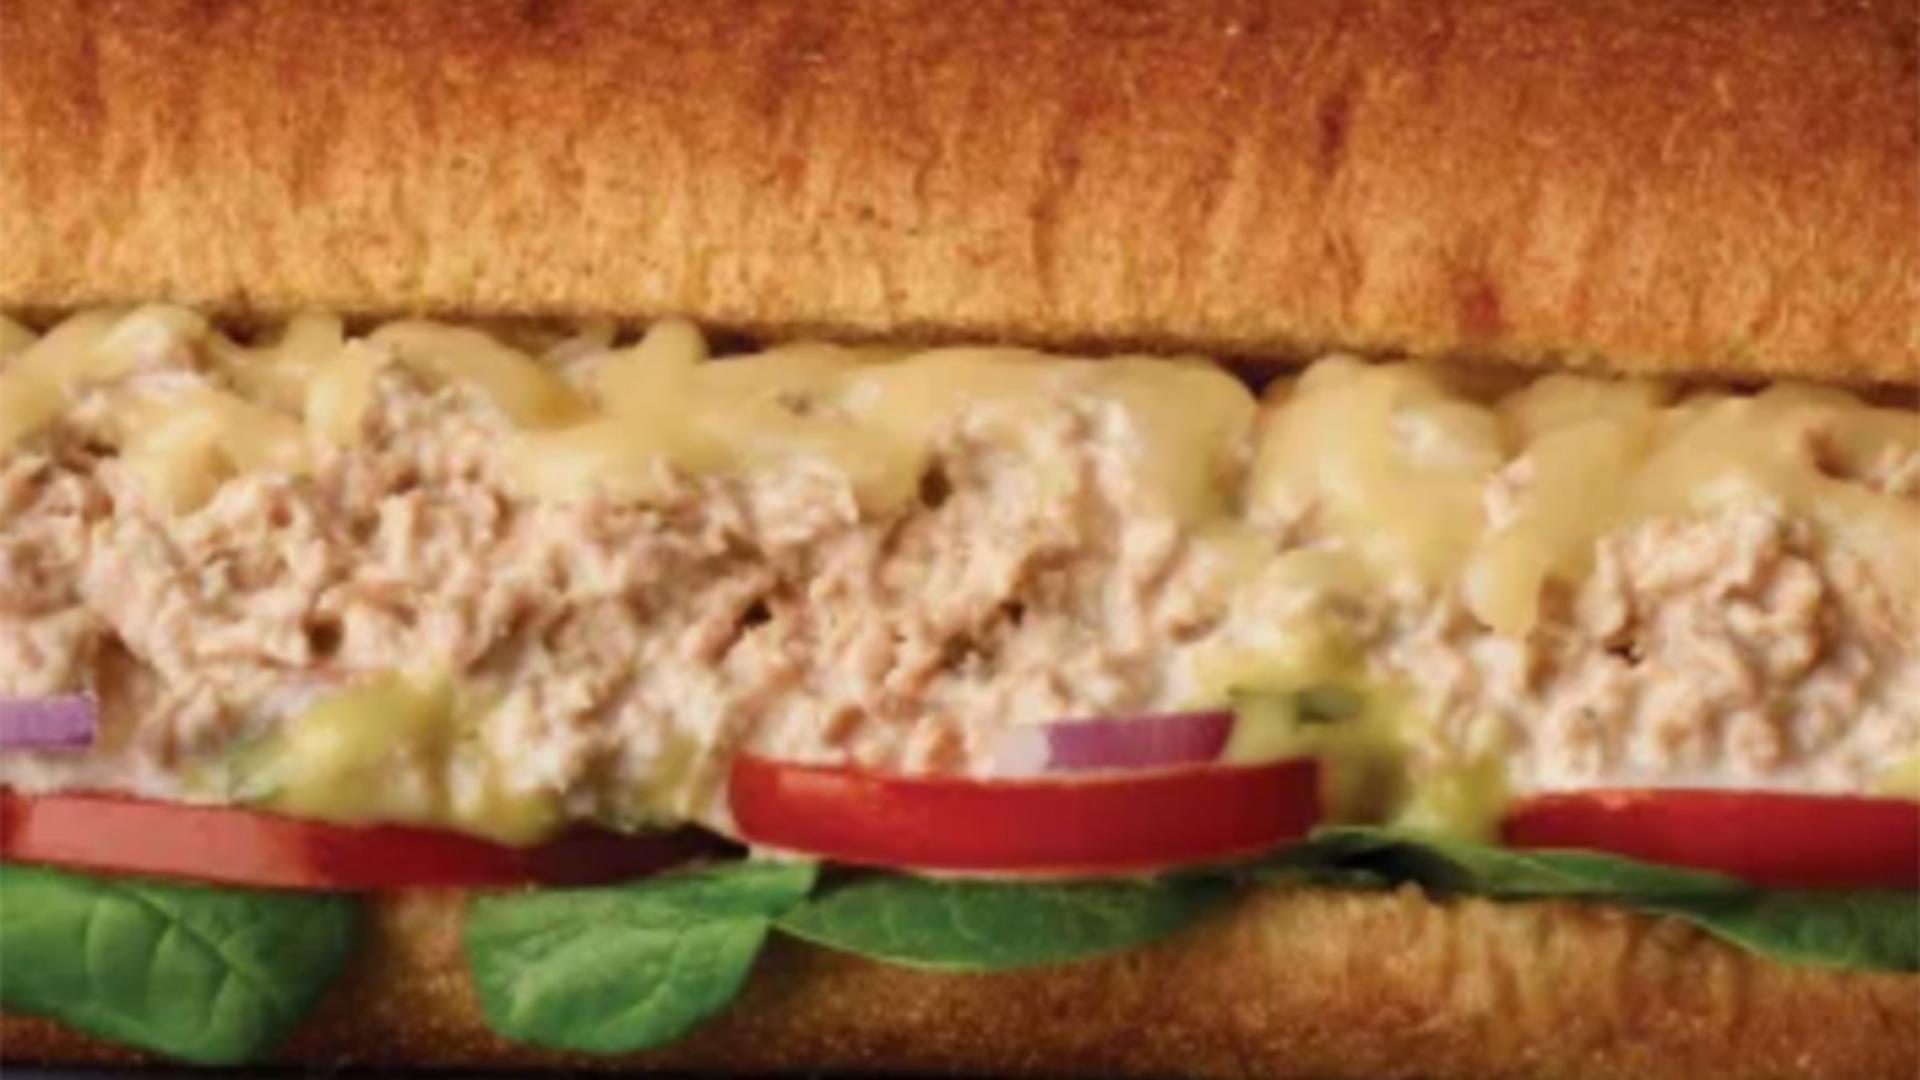 Sandwich cu ton, care nu are...ton. Foto/www.eatthis.com